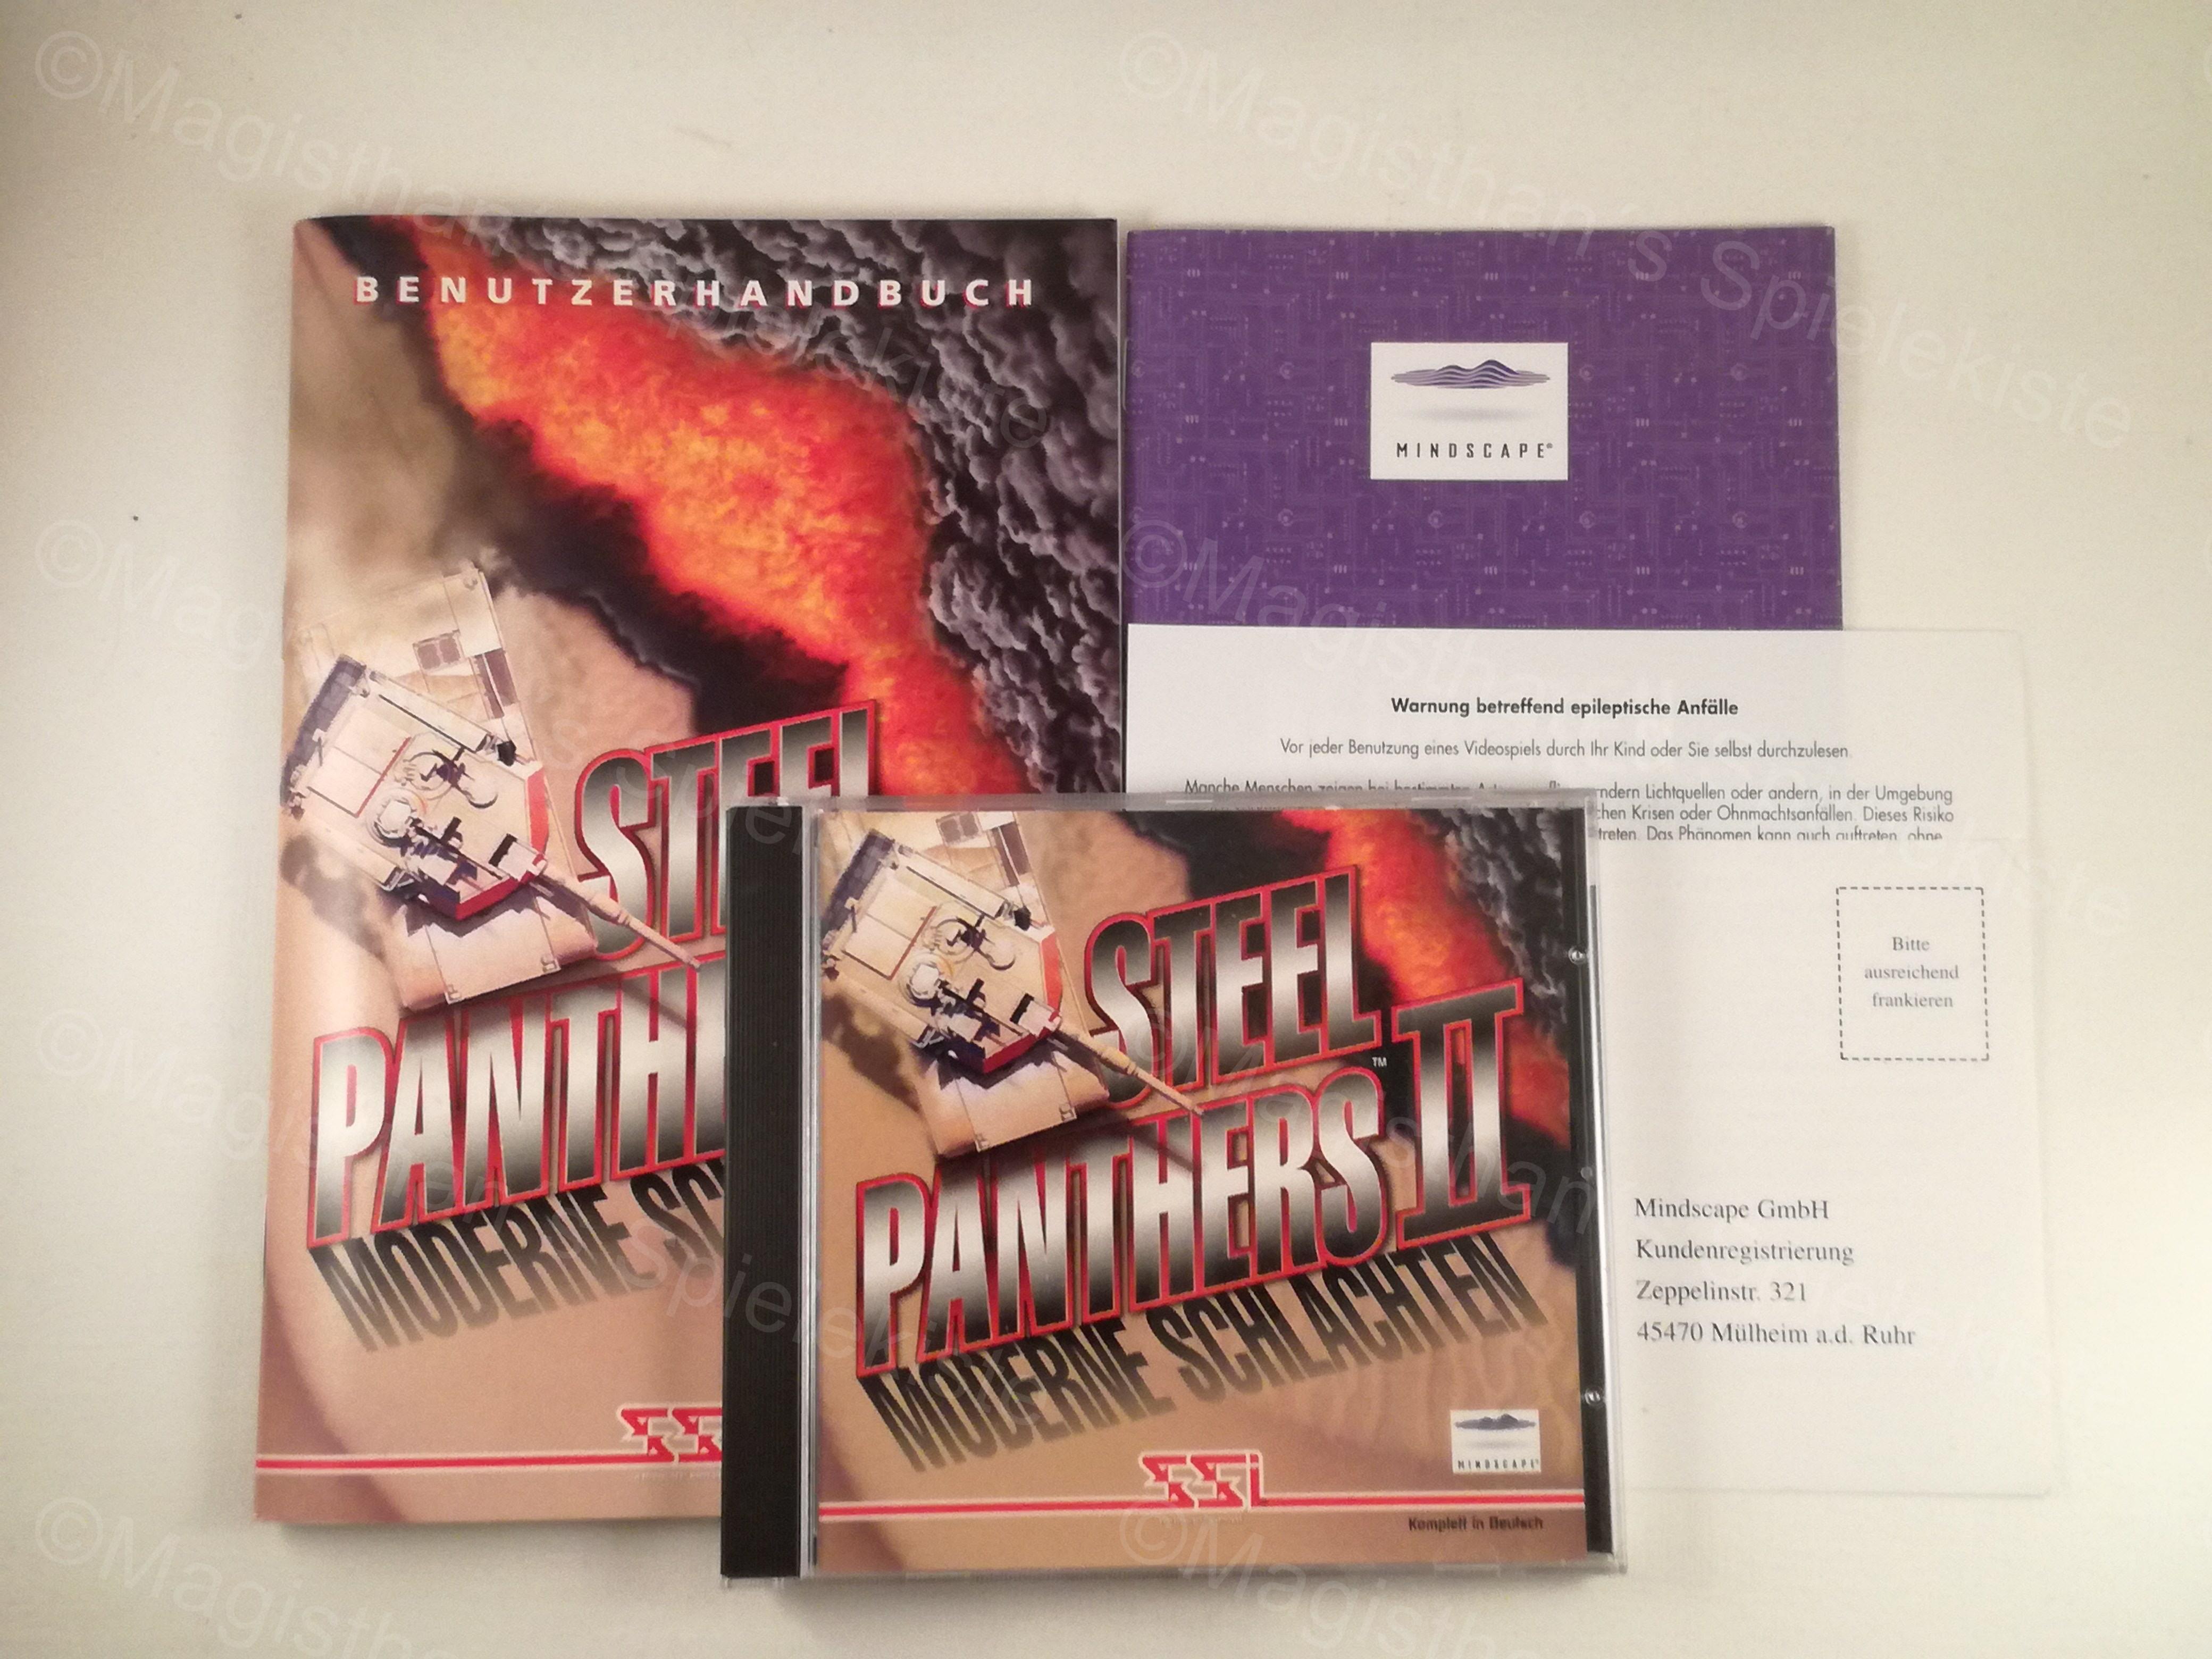 SteelPanthers22.jpg